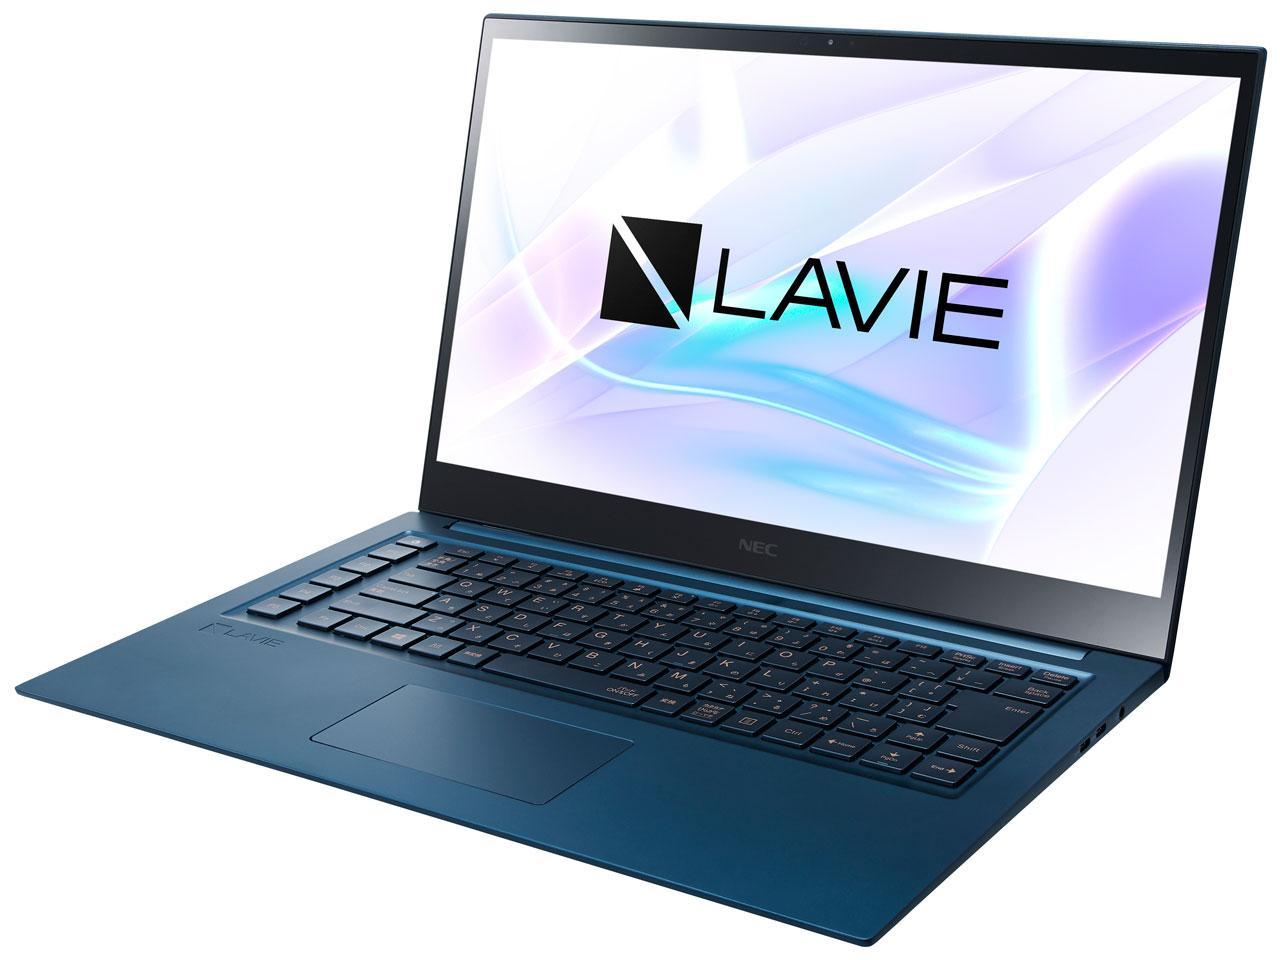 NEC PC-LV650RAL ノートパソコン LAVIE VEGA アルマイトネイビー(PC-LV650RAL)【smtb-s】